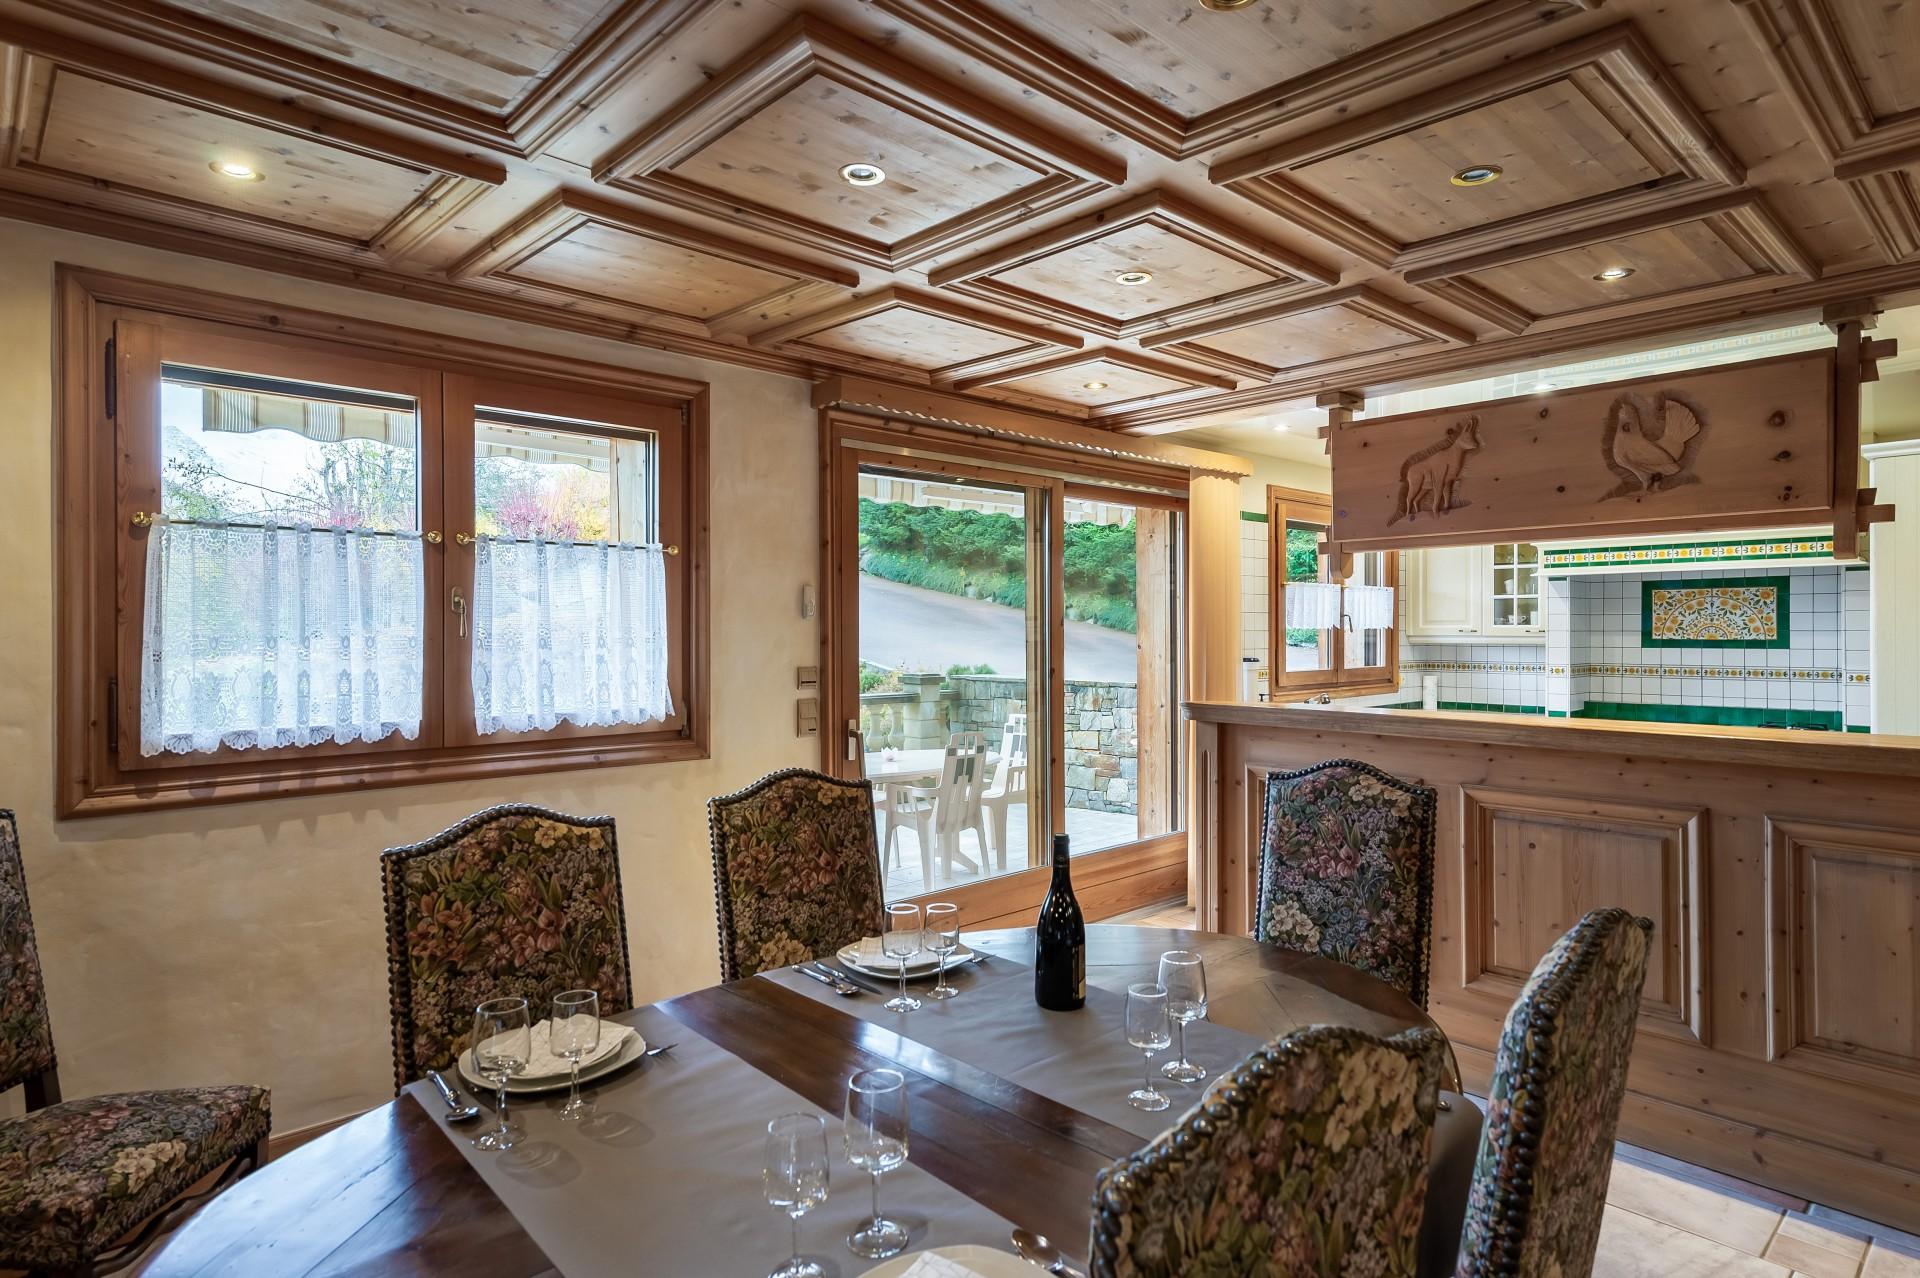 Saint Gervais Luxury Rental Chalet Galena Dining Room 2